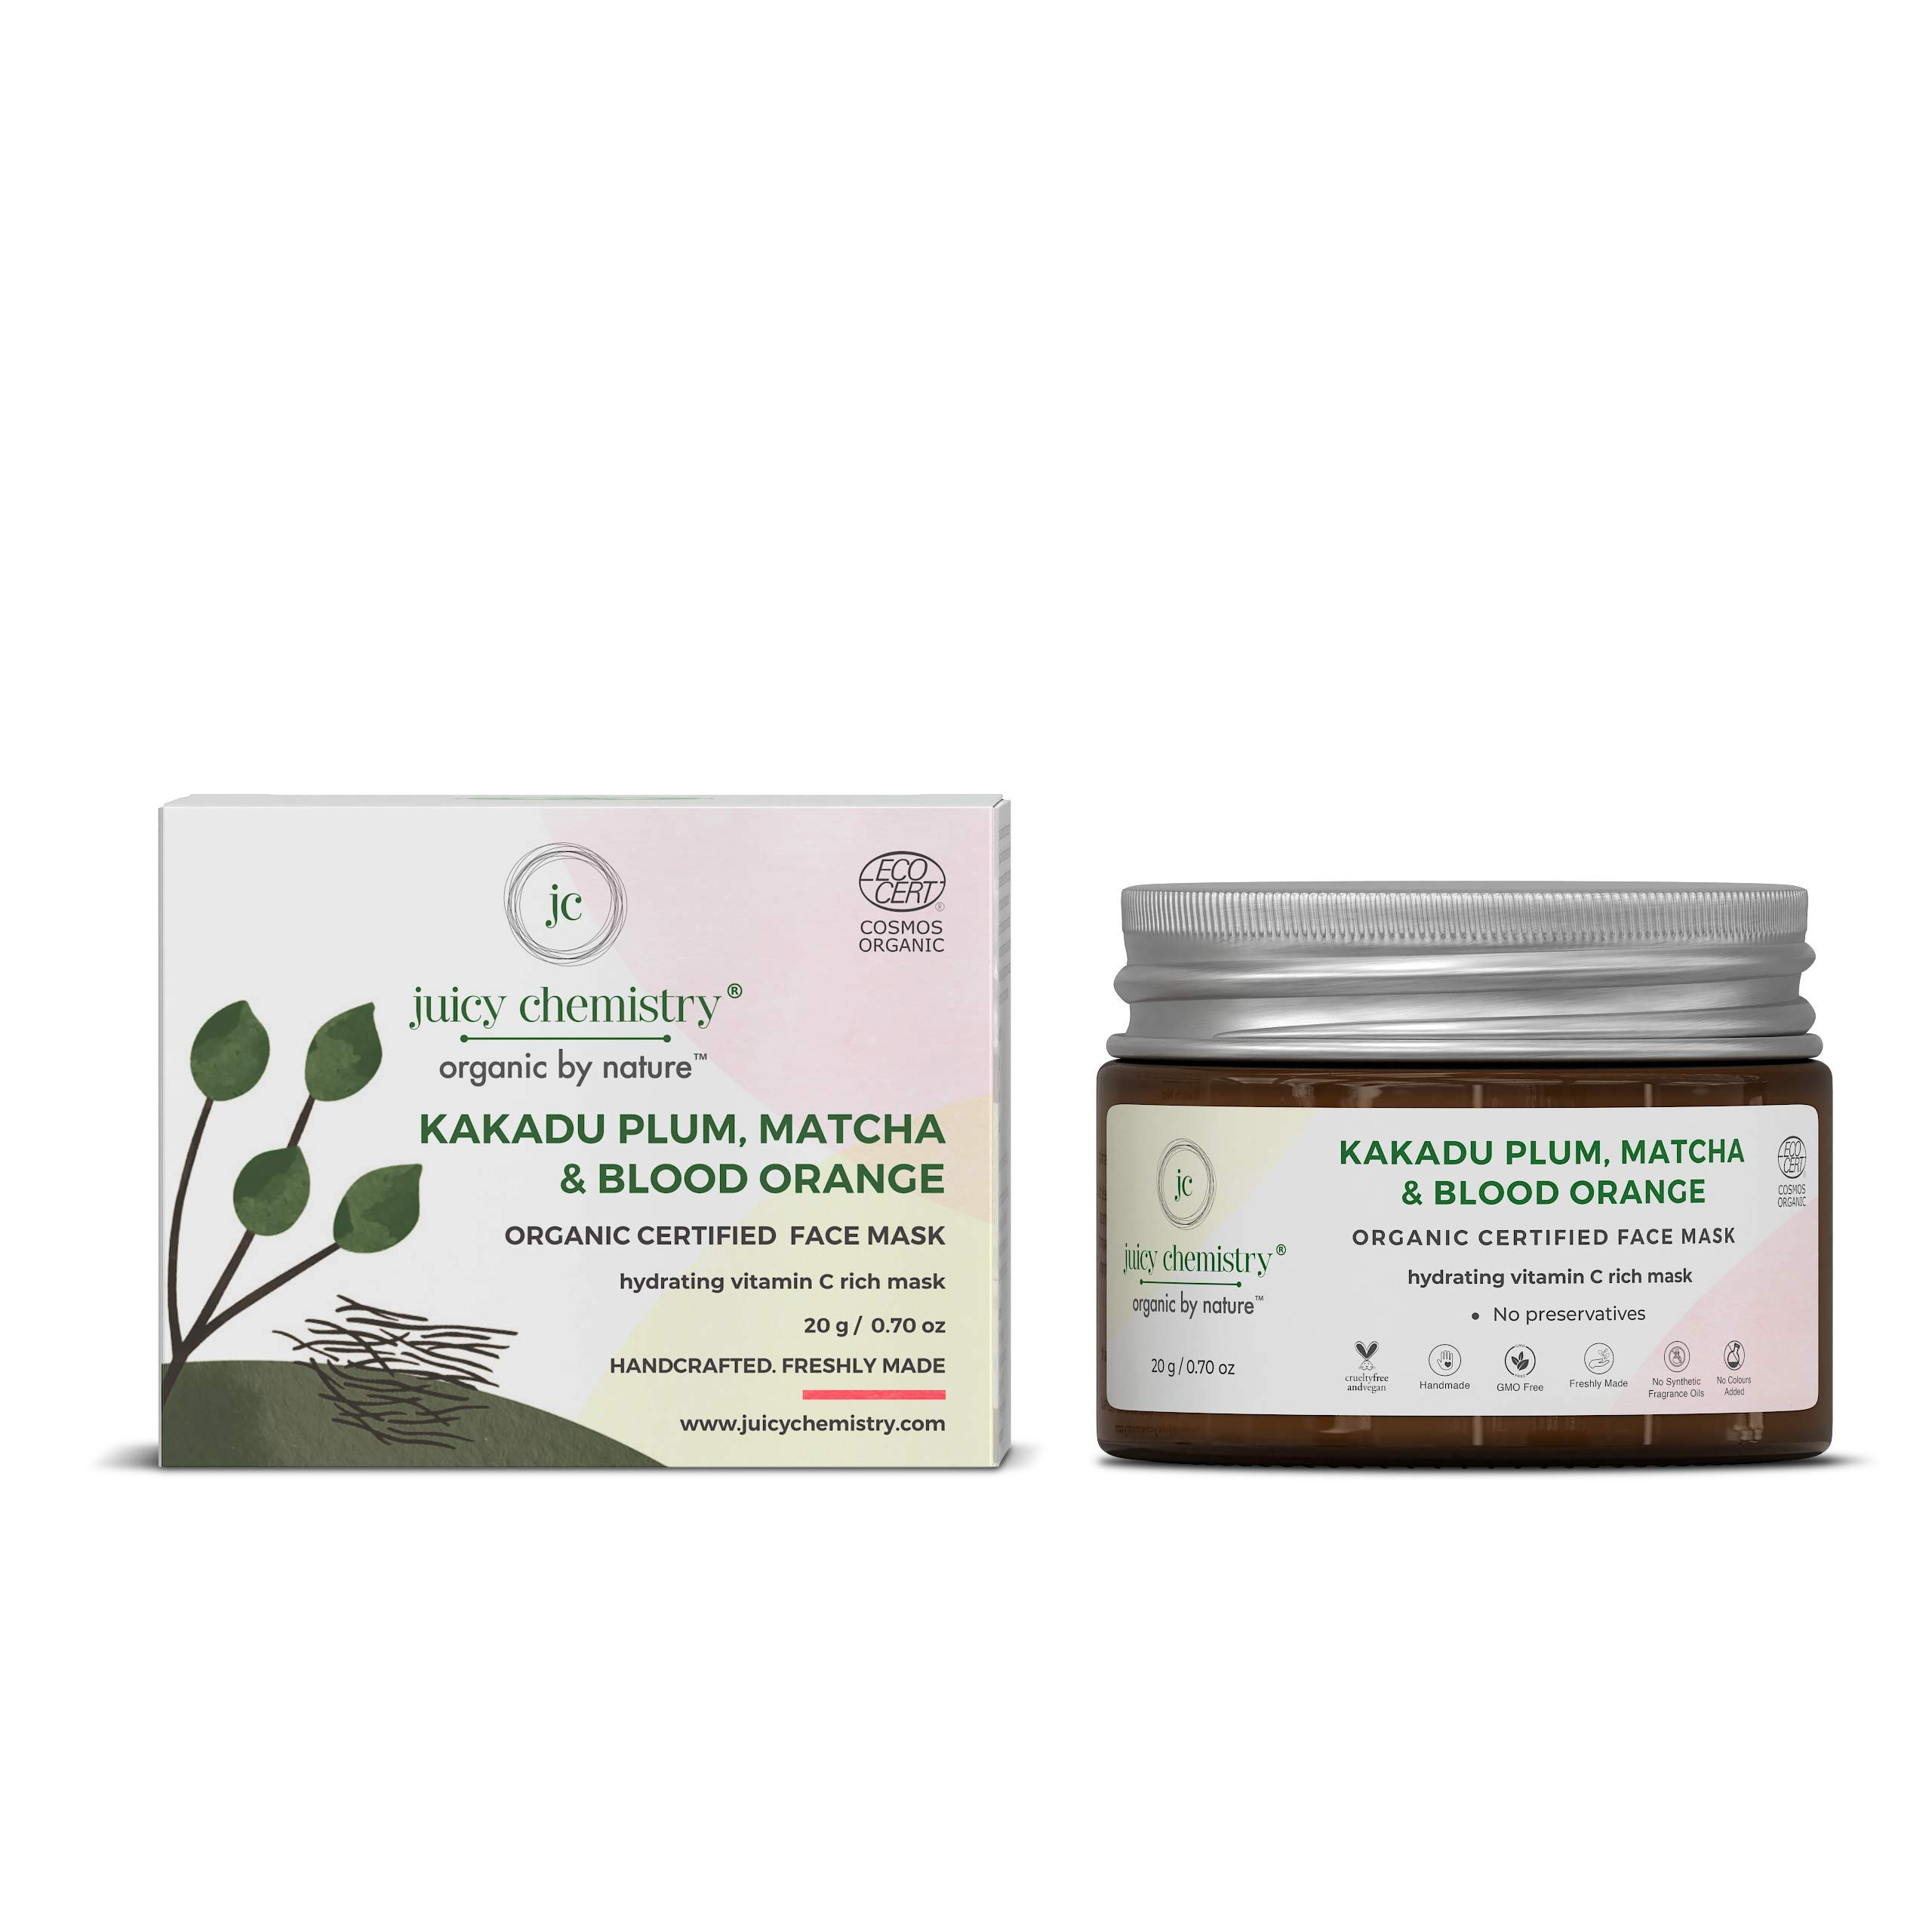 Juicy Chemistry Kakadu Plum, Matcha & Blood Orange Organic Face Mask For Glowing Skin & Acne Removal, 20 Gm